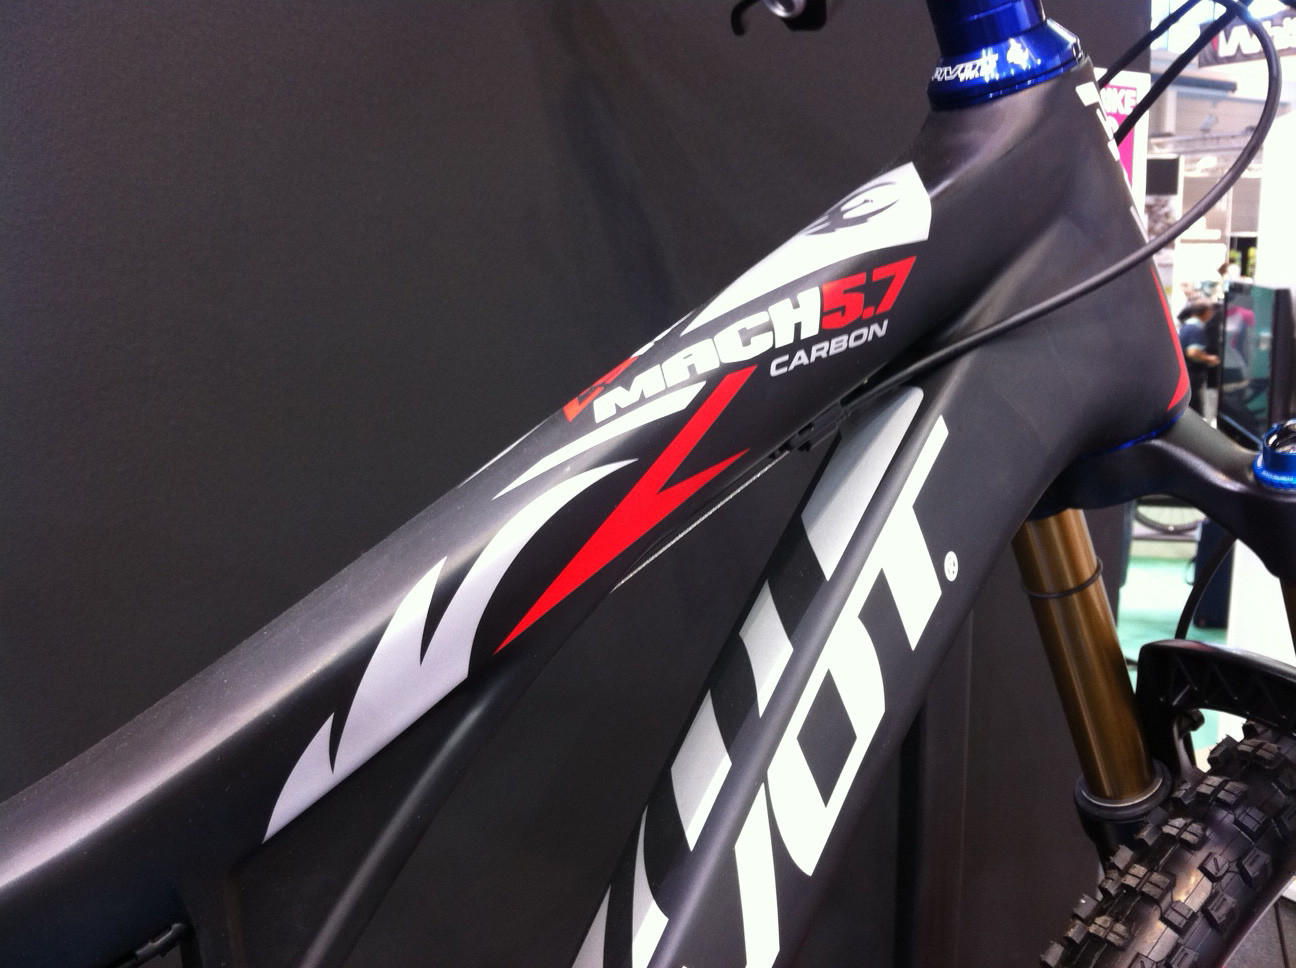 Pivot Mach 5.7 detail - Eurobike 2011 - Mountain Biking Pictures - Vital MTB